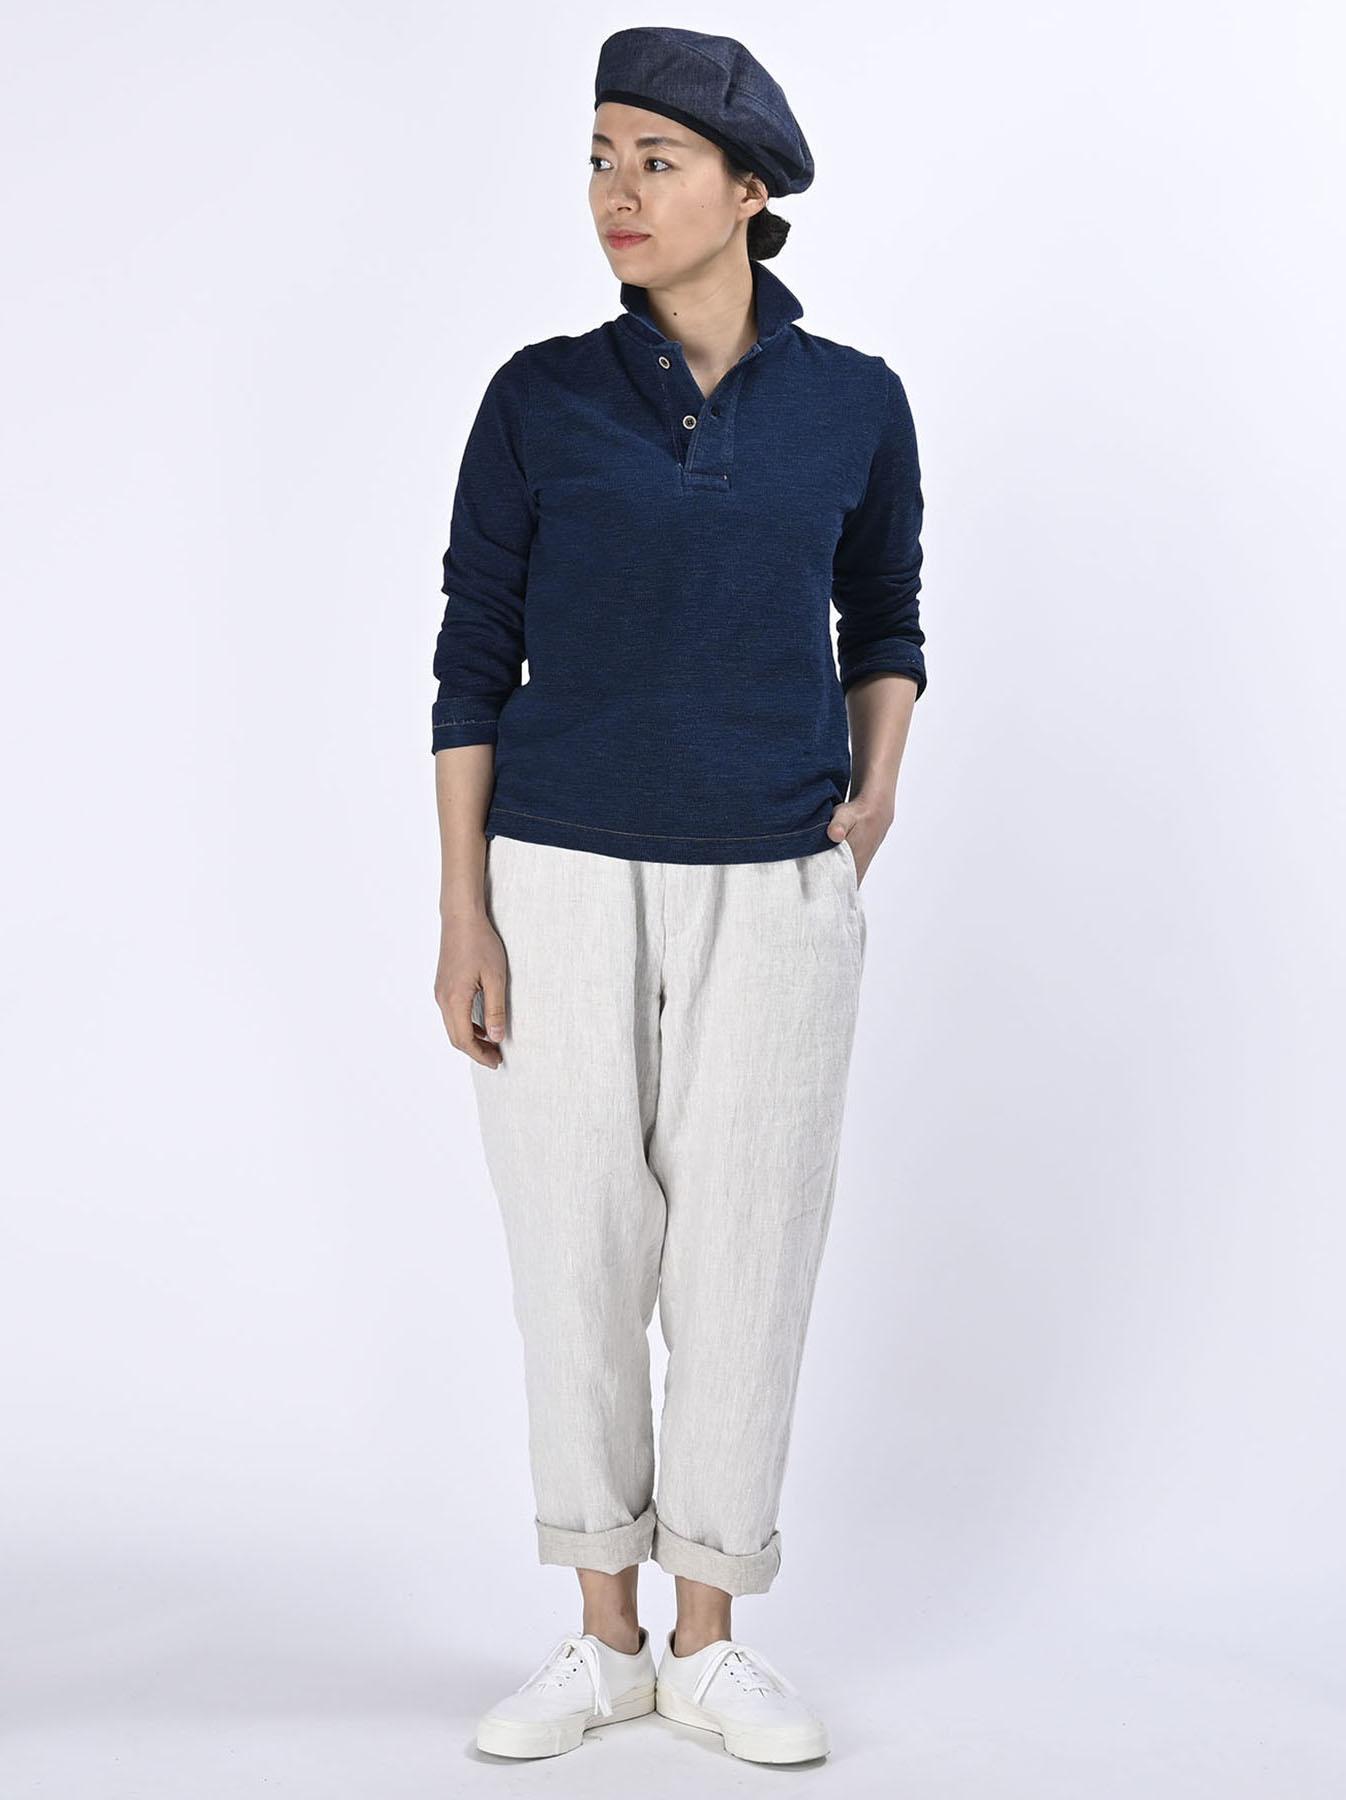 Indigo Kanoko Shiokaze Long-sleeved Square Polo Shirt (0521)-2